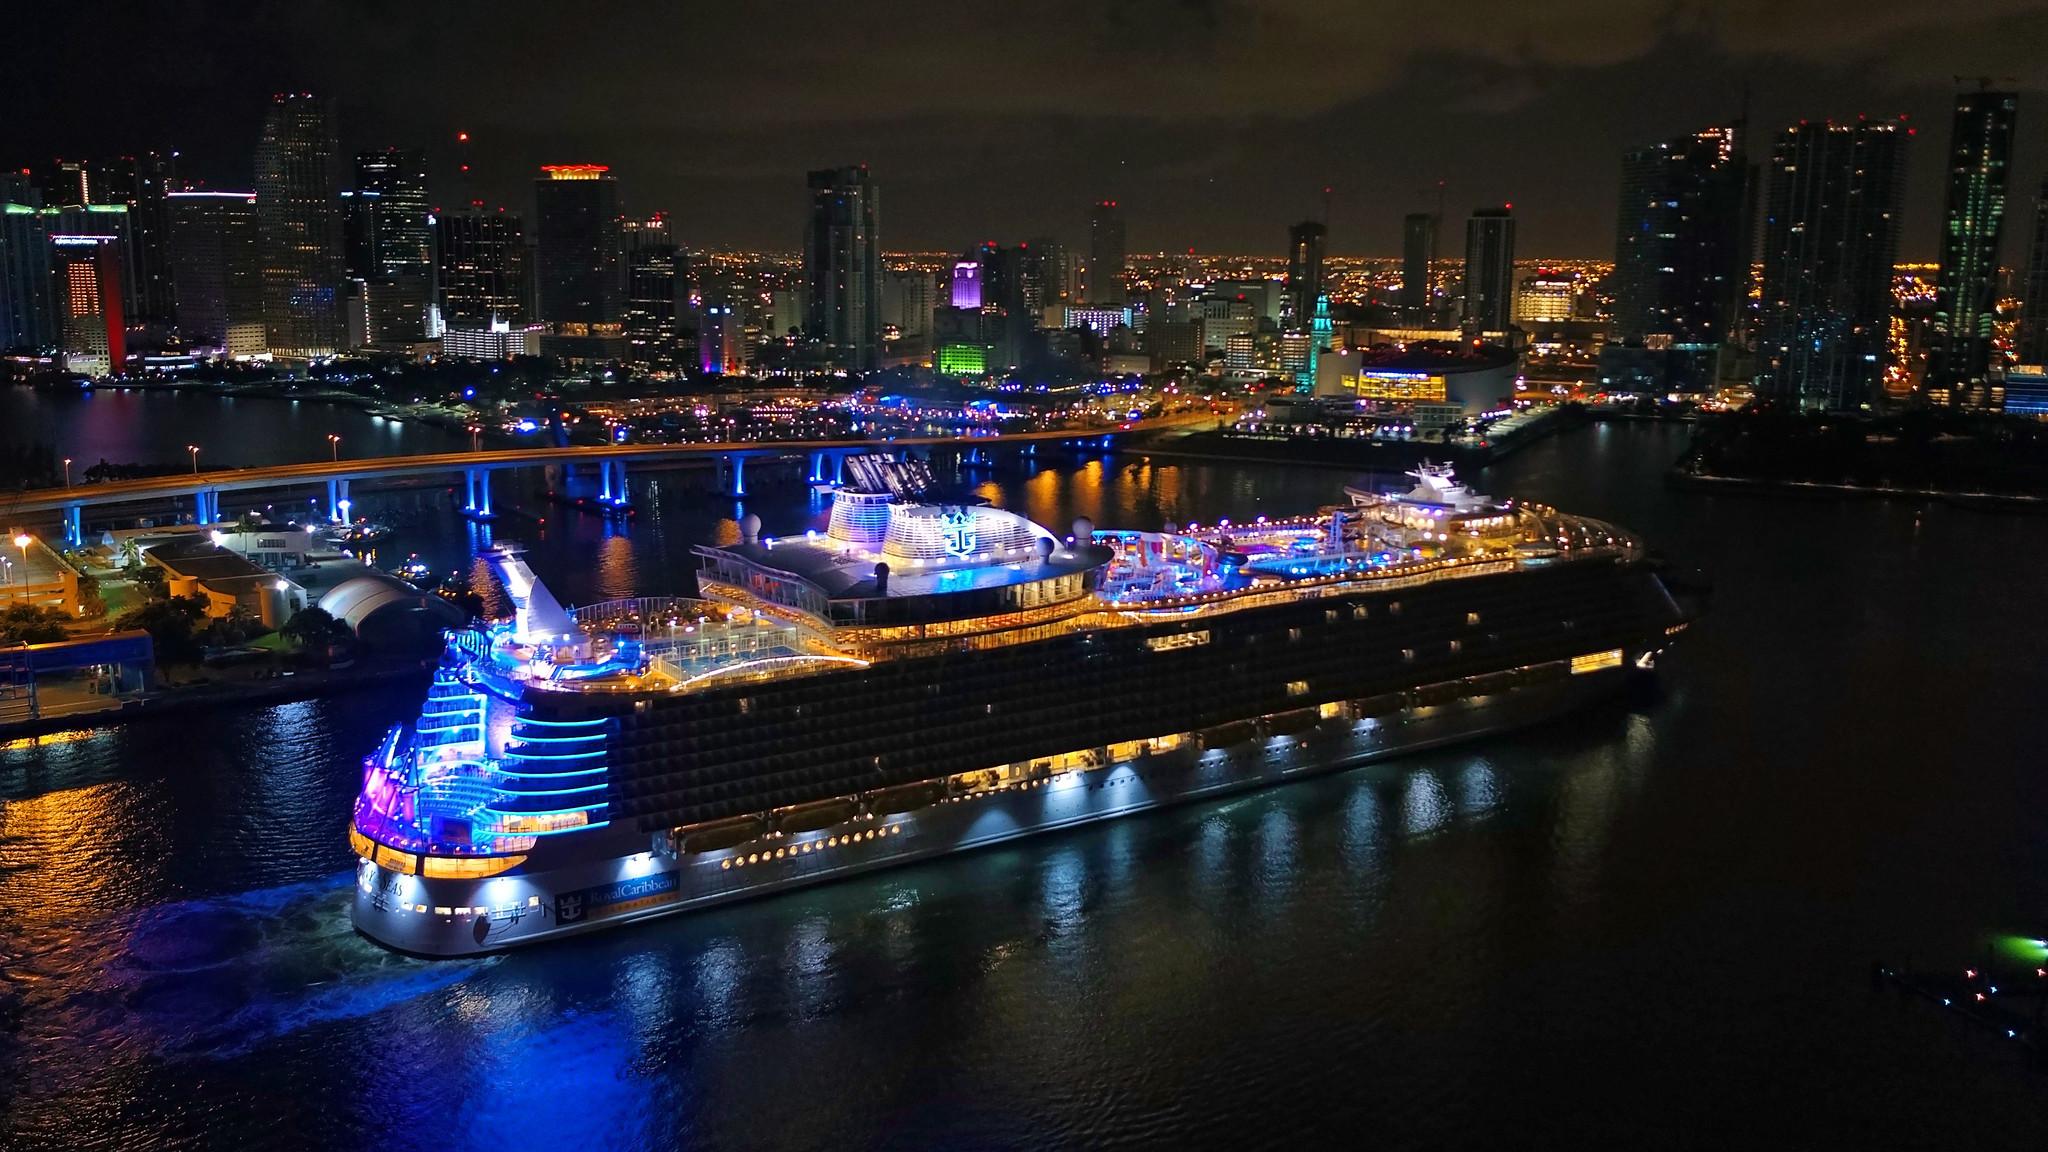 Royal Caribbean starts building next world's largest cruise ship